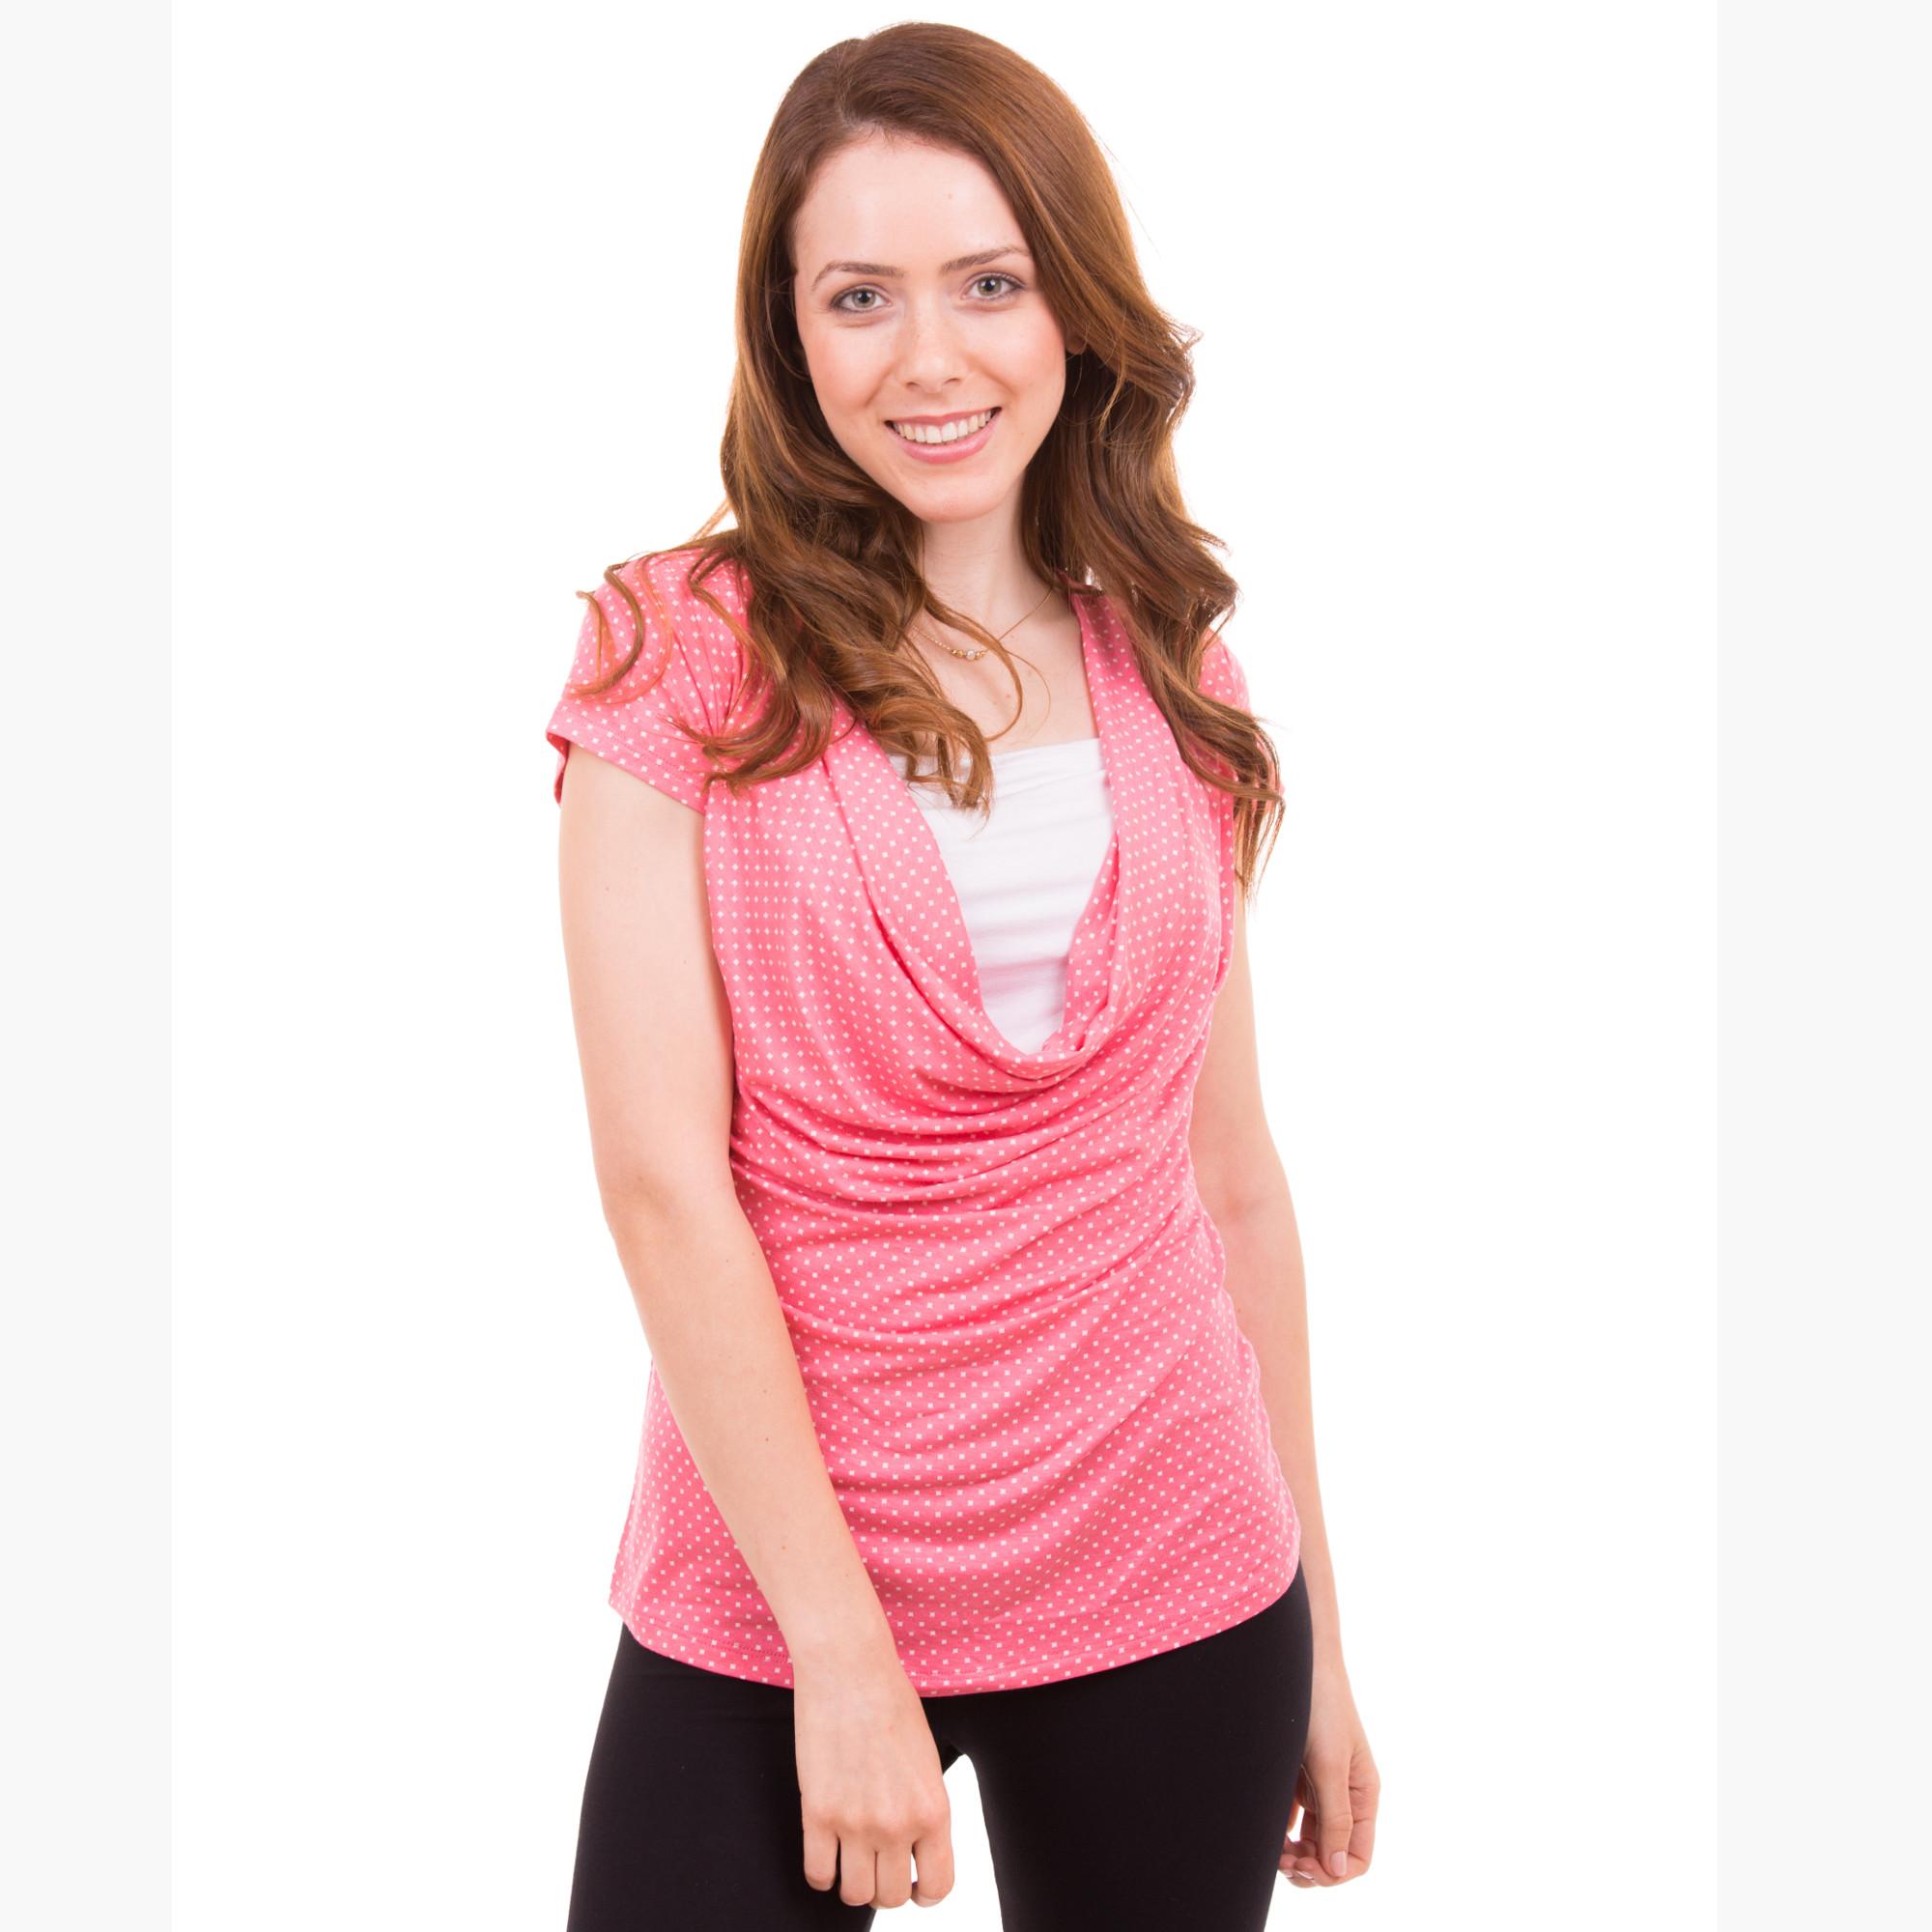 Classic Pink Summer Nursing Top